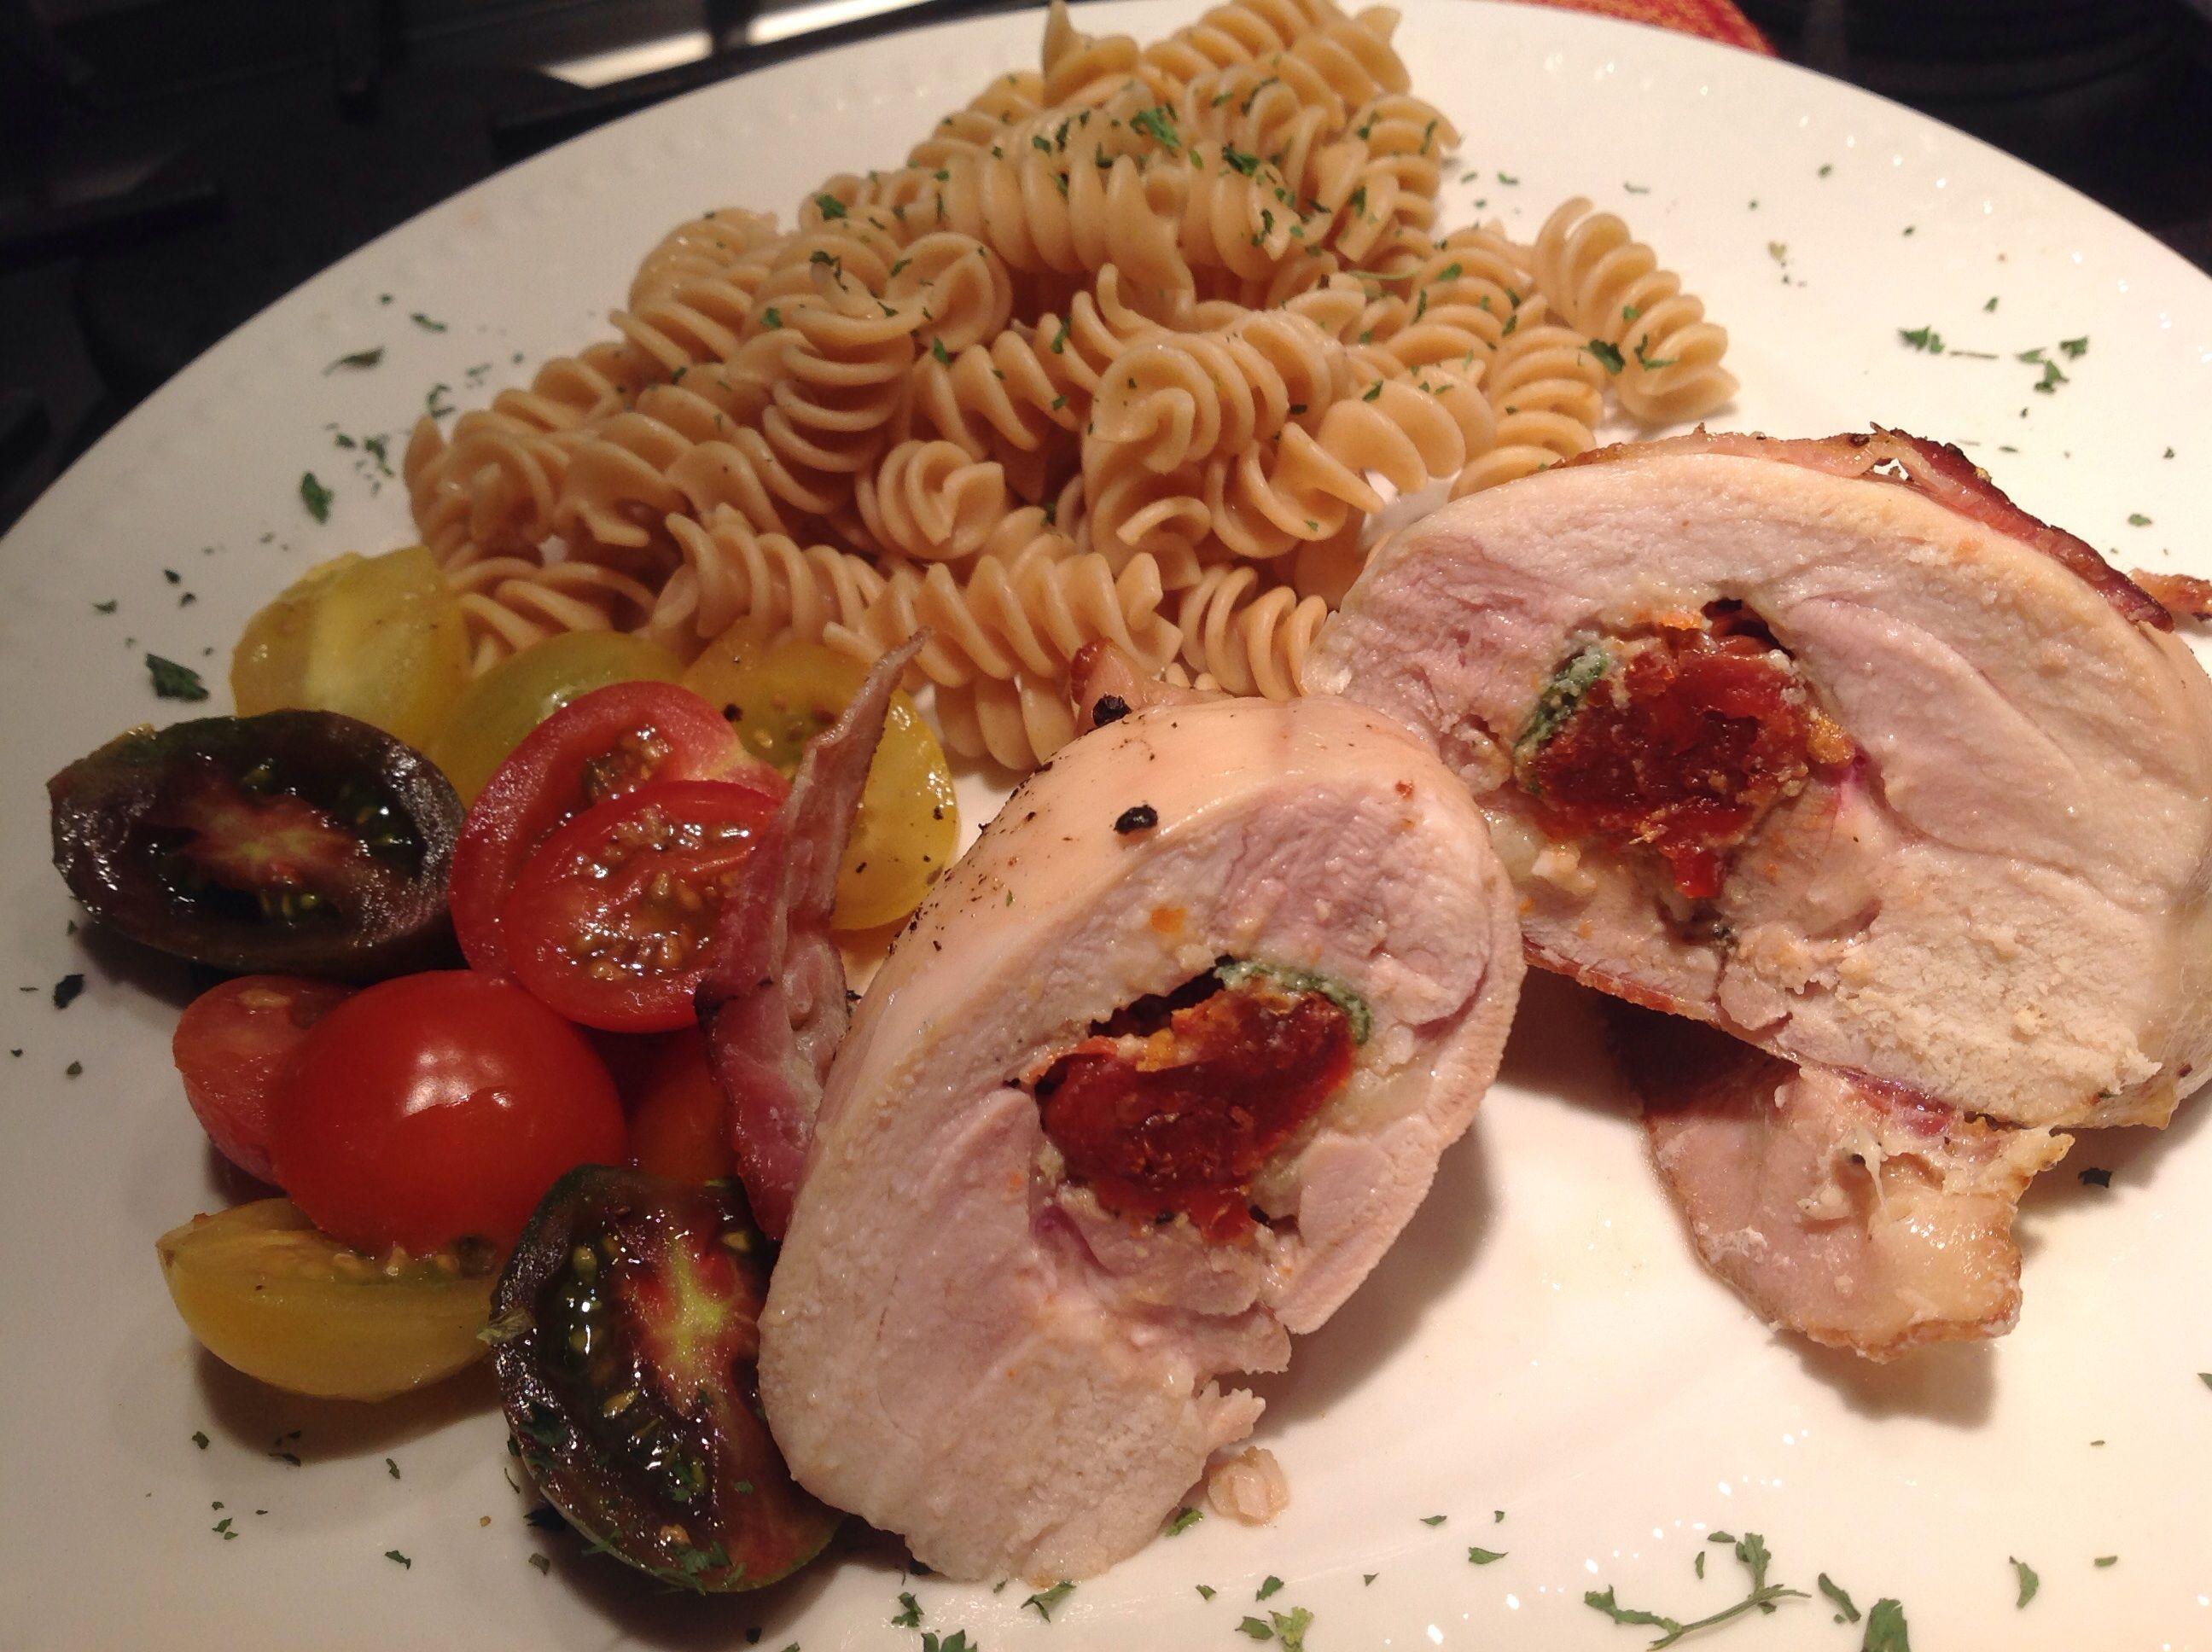 Mascarpone Sage and Sundried Tomato-Stuffed Chicken Thighs